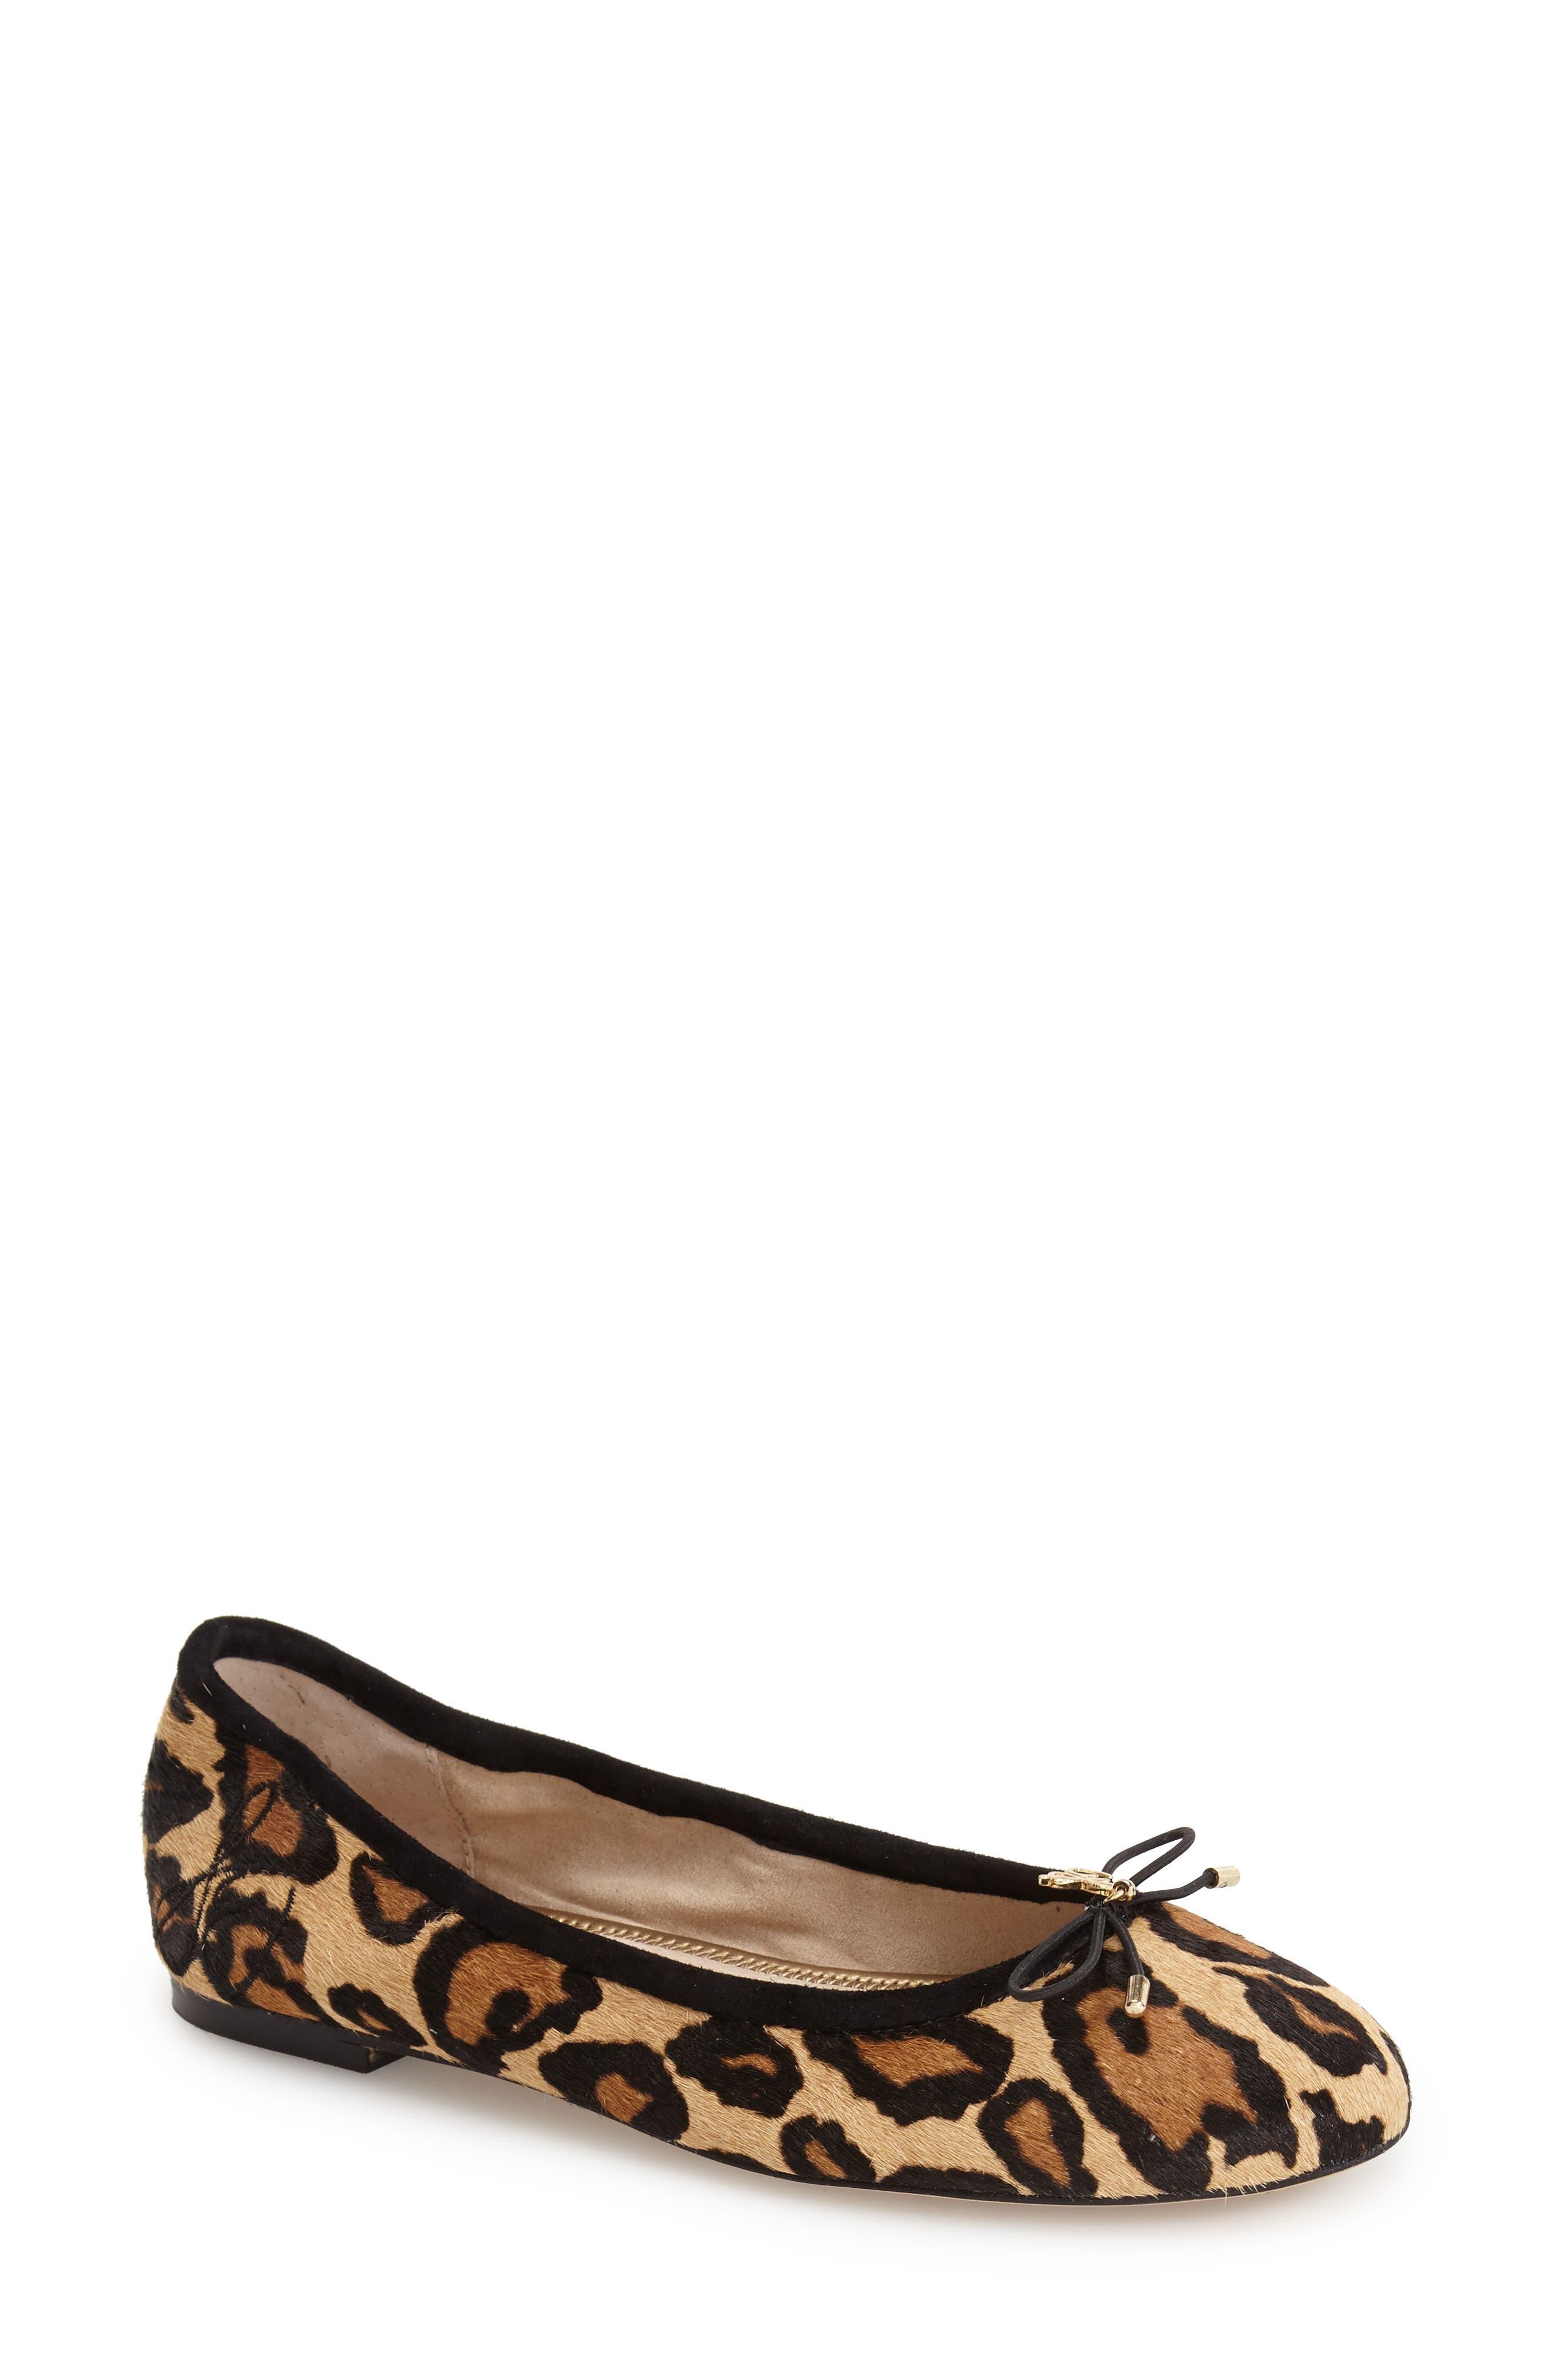 'Felicia' Flat,                         Main,                         color, New Nude Leopard Calf Hair